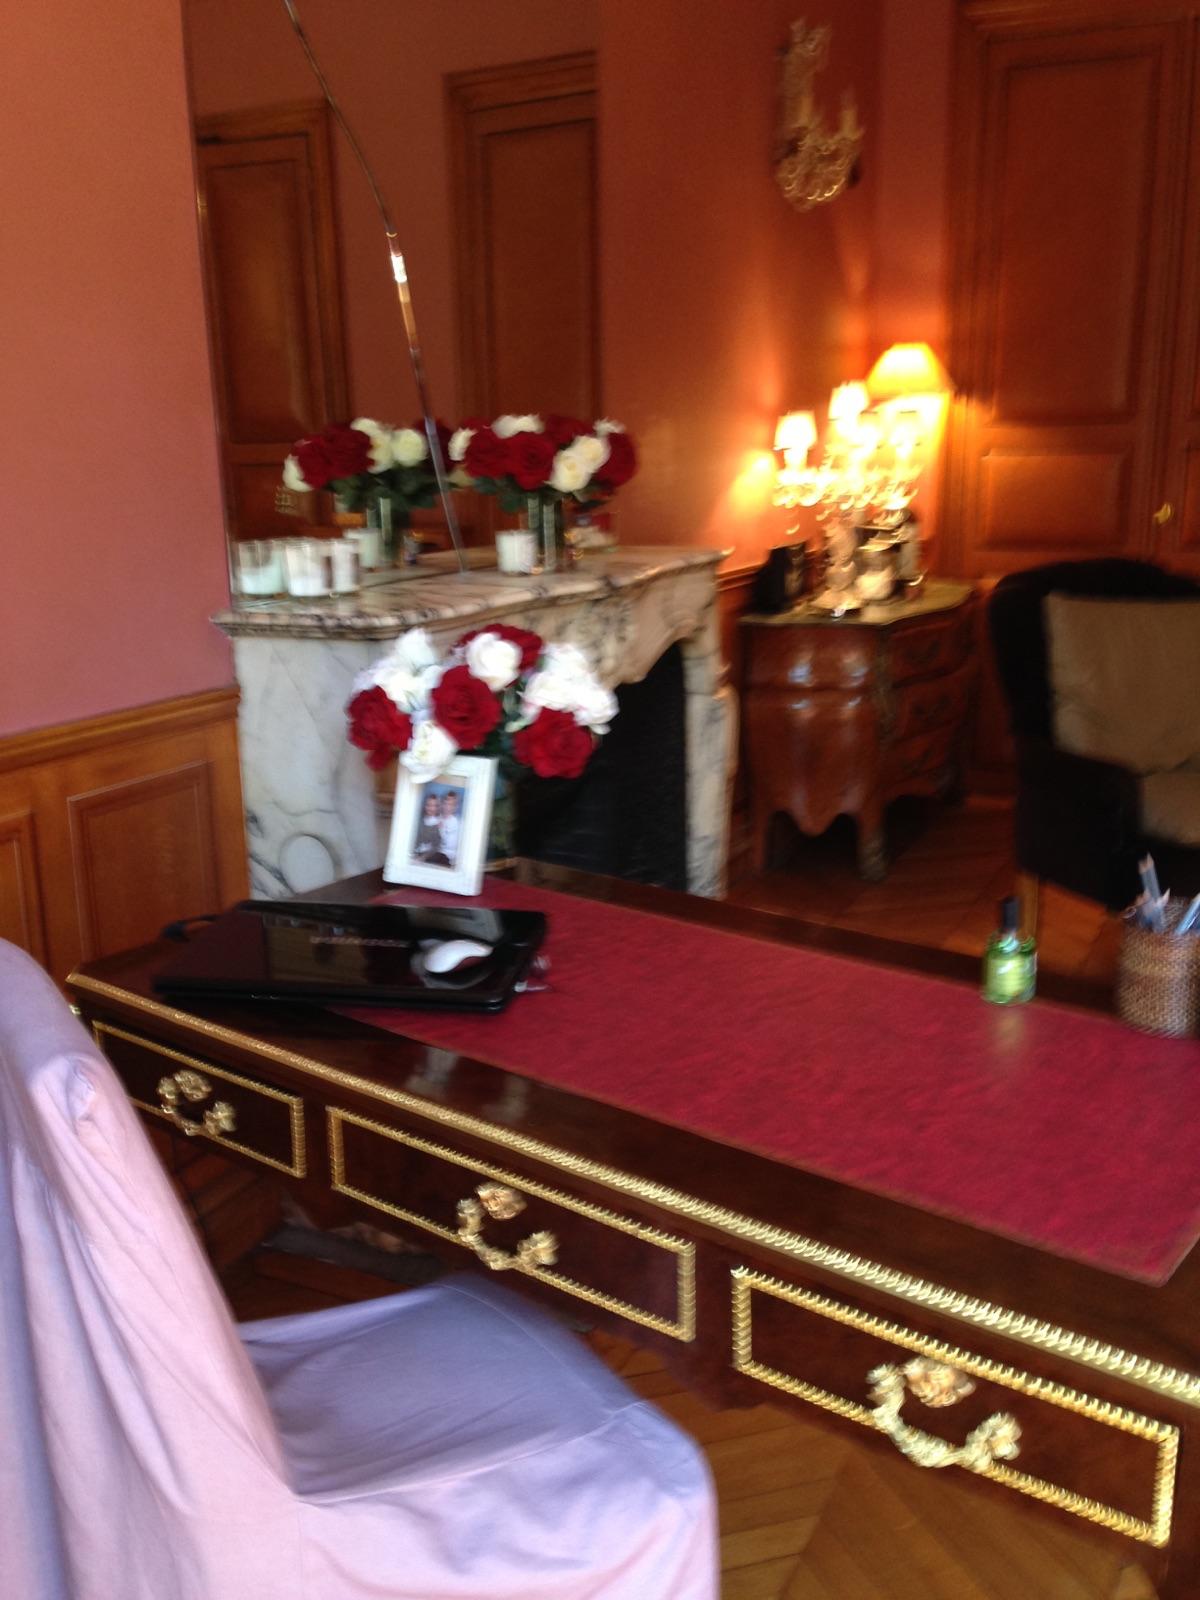 psychologue paris 17 christine toth. Black Bedroom Furniture Sets. Home Design Ideas